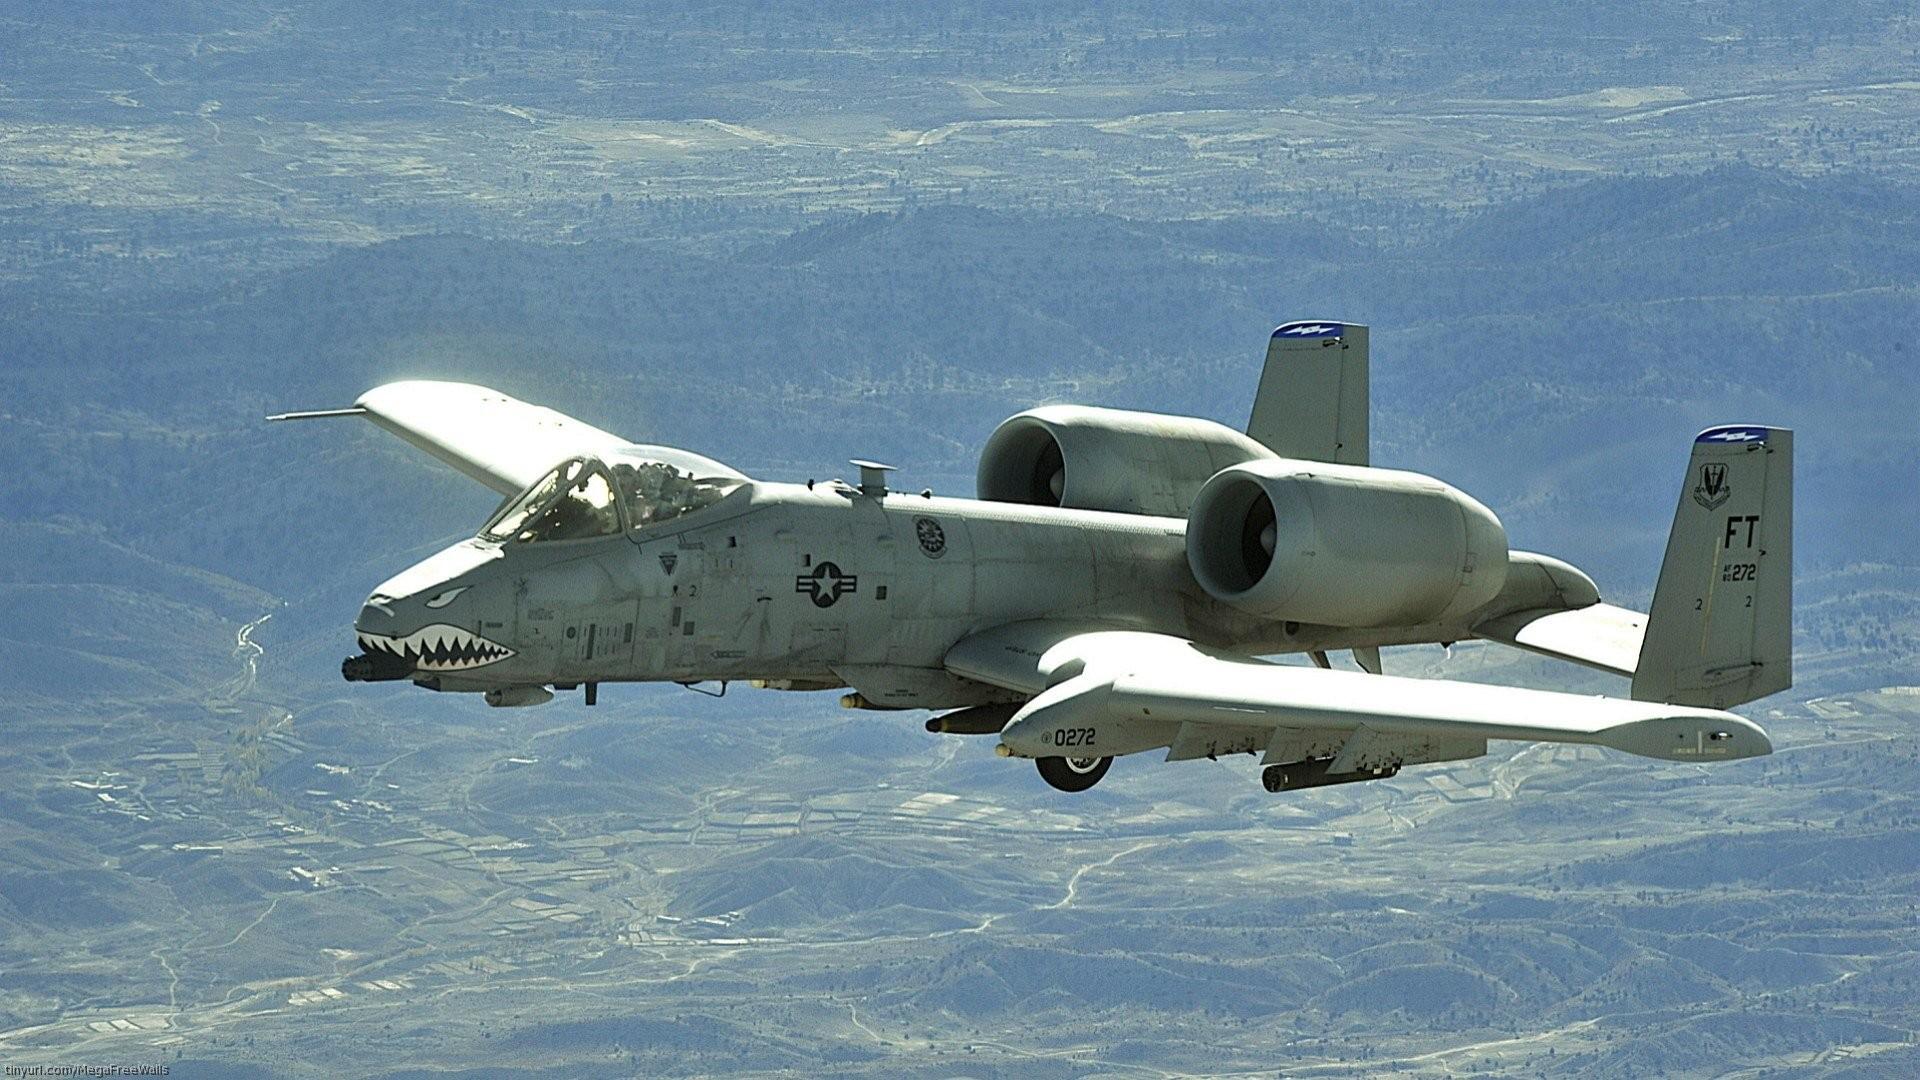 Amazing Fairchild Republic A-10 Thunderbolt II Pictures & Backgrounds